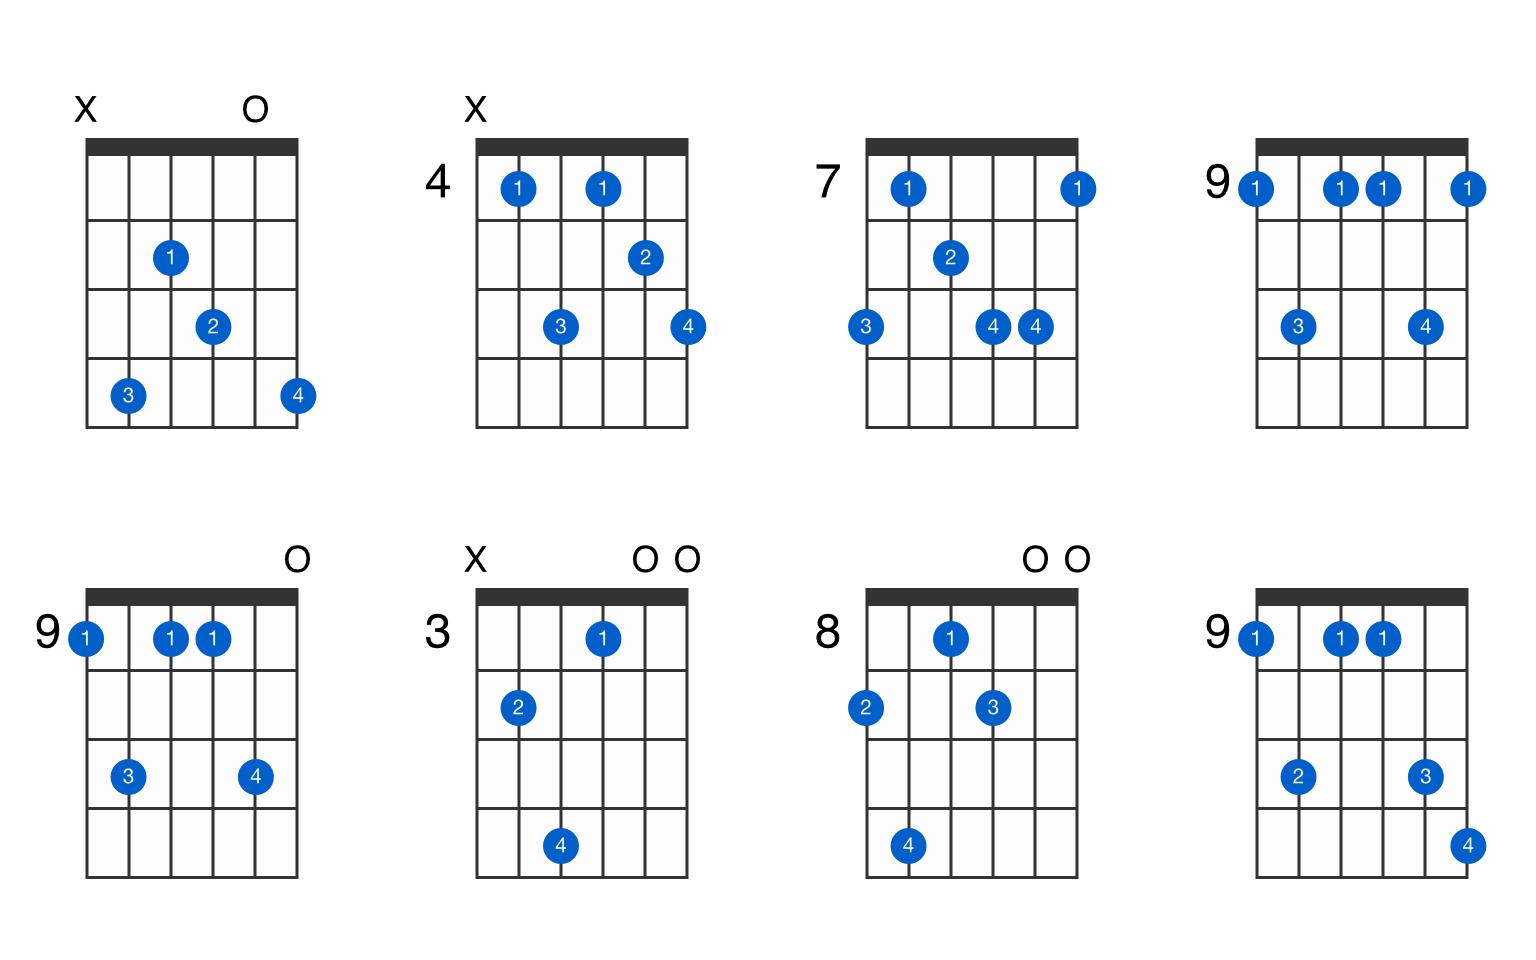 C sharp minor 15th add 15 guitar chord   GtrLib Chords